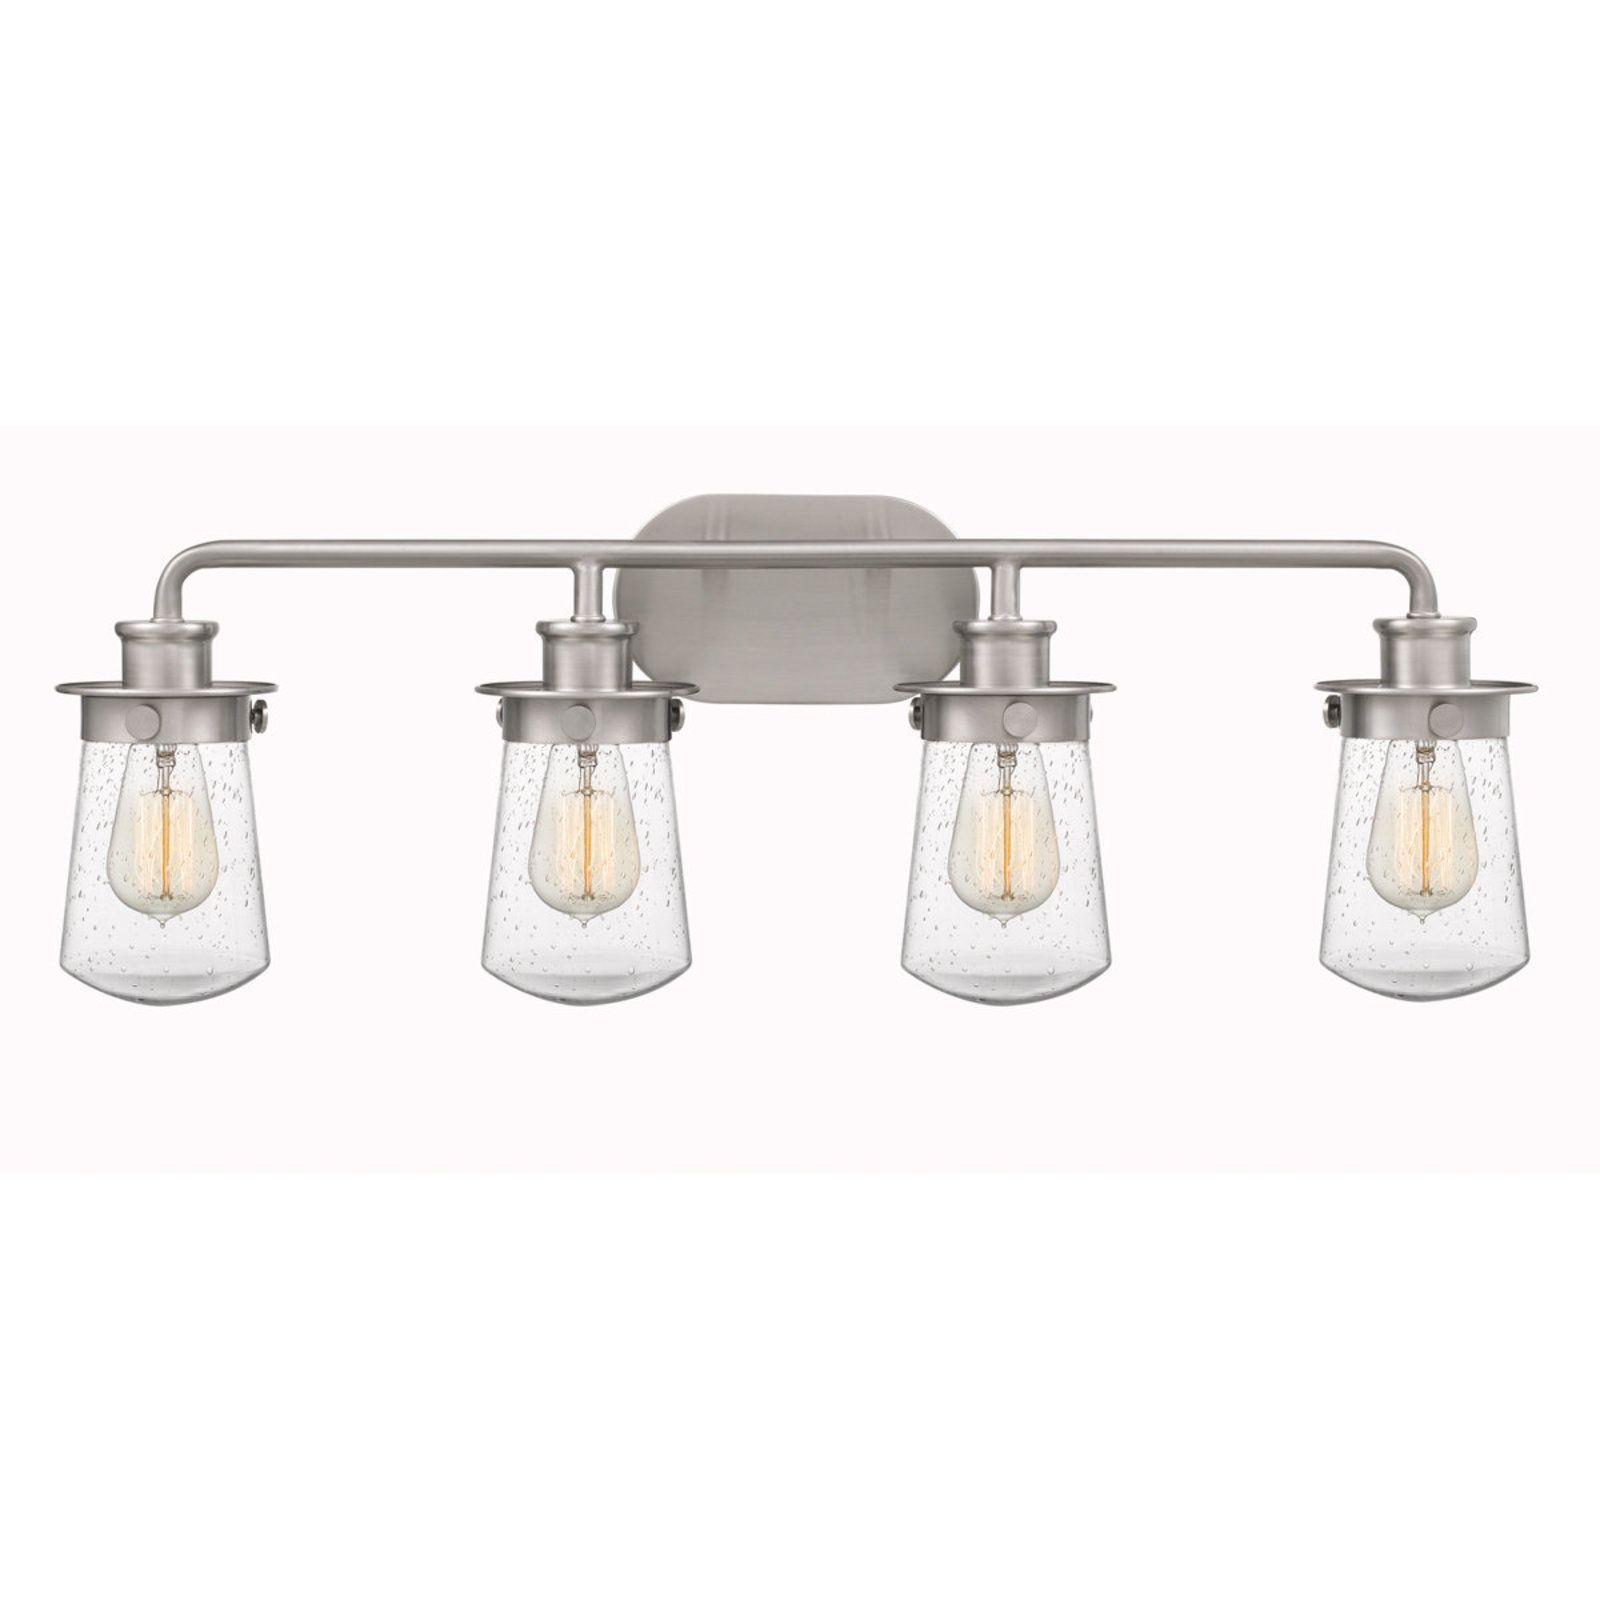 Soft Dome Vanity Light 4 Light Vanity Lighting Industrial